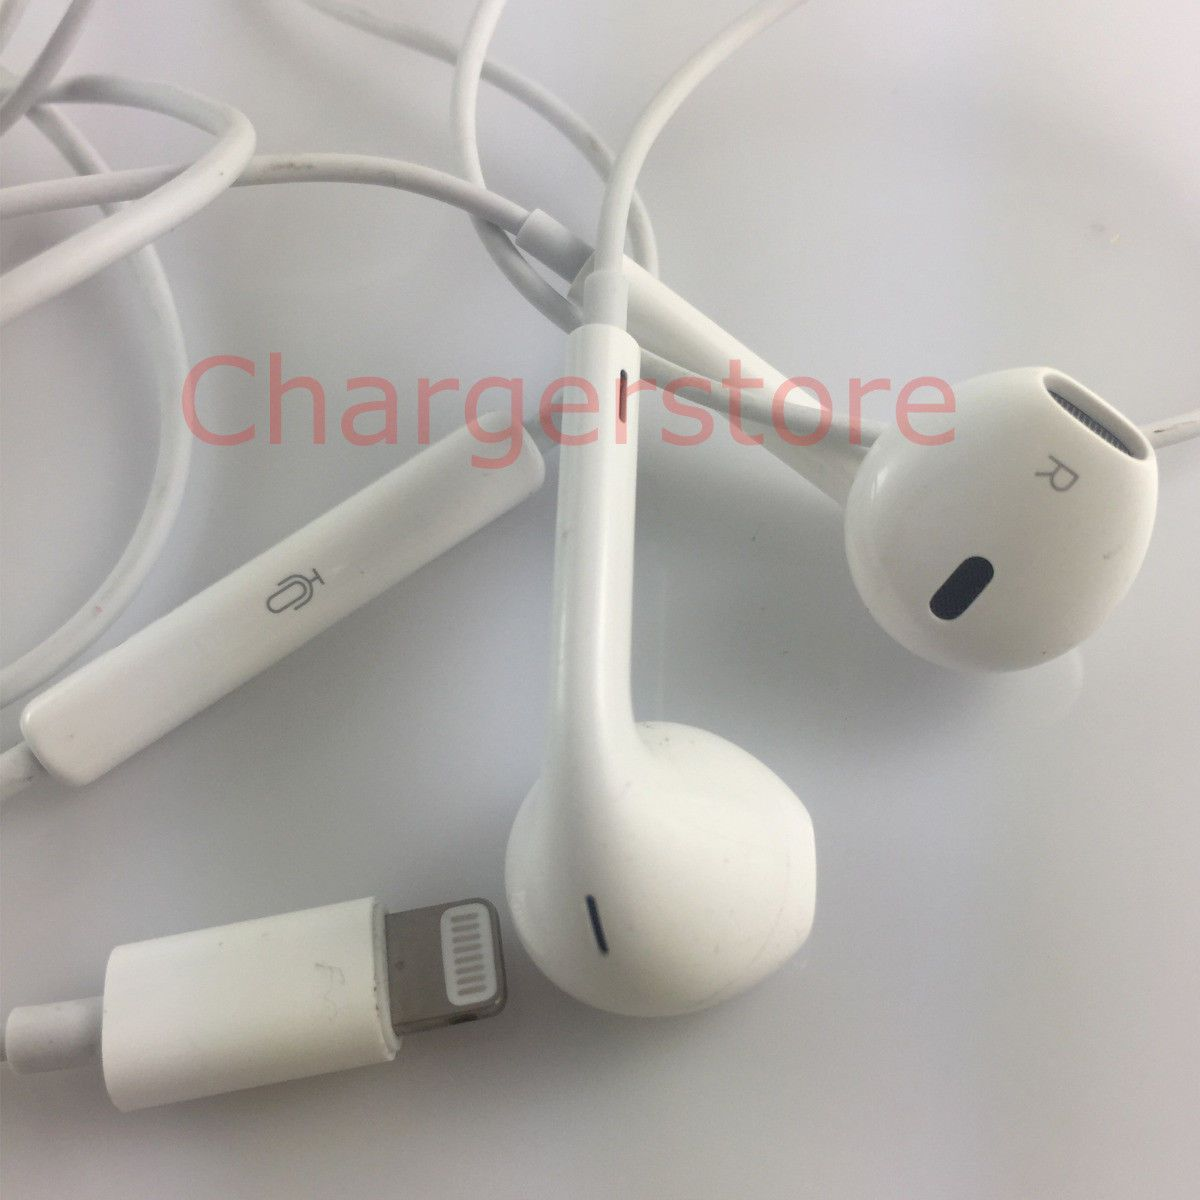 Lækker Details about Original Apple Earpods with Lightning Connector SZ-07